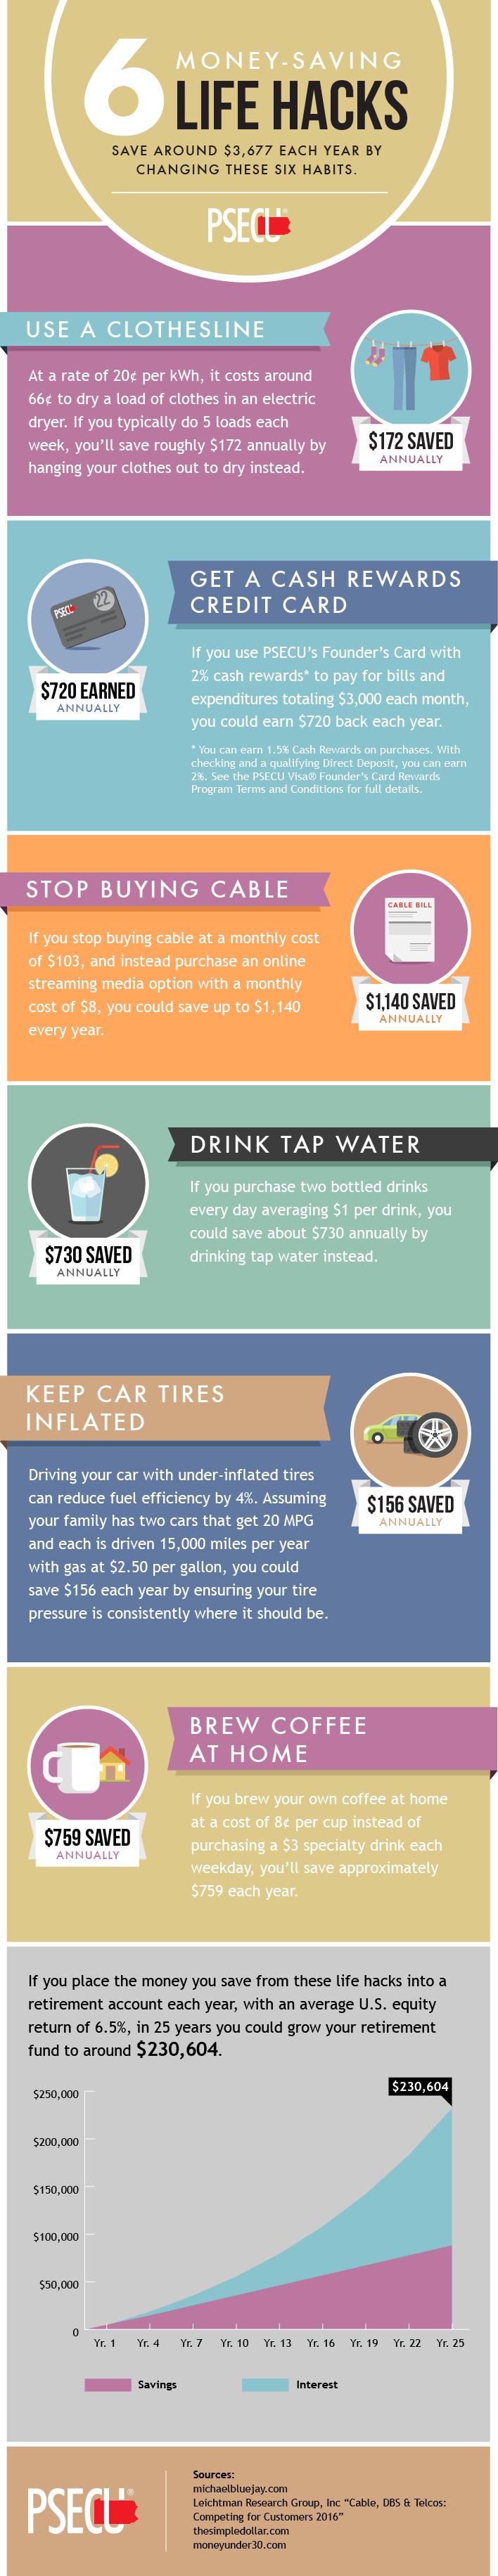 6 Money-saving Life Hacks #infographic